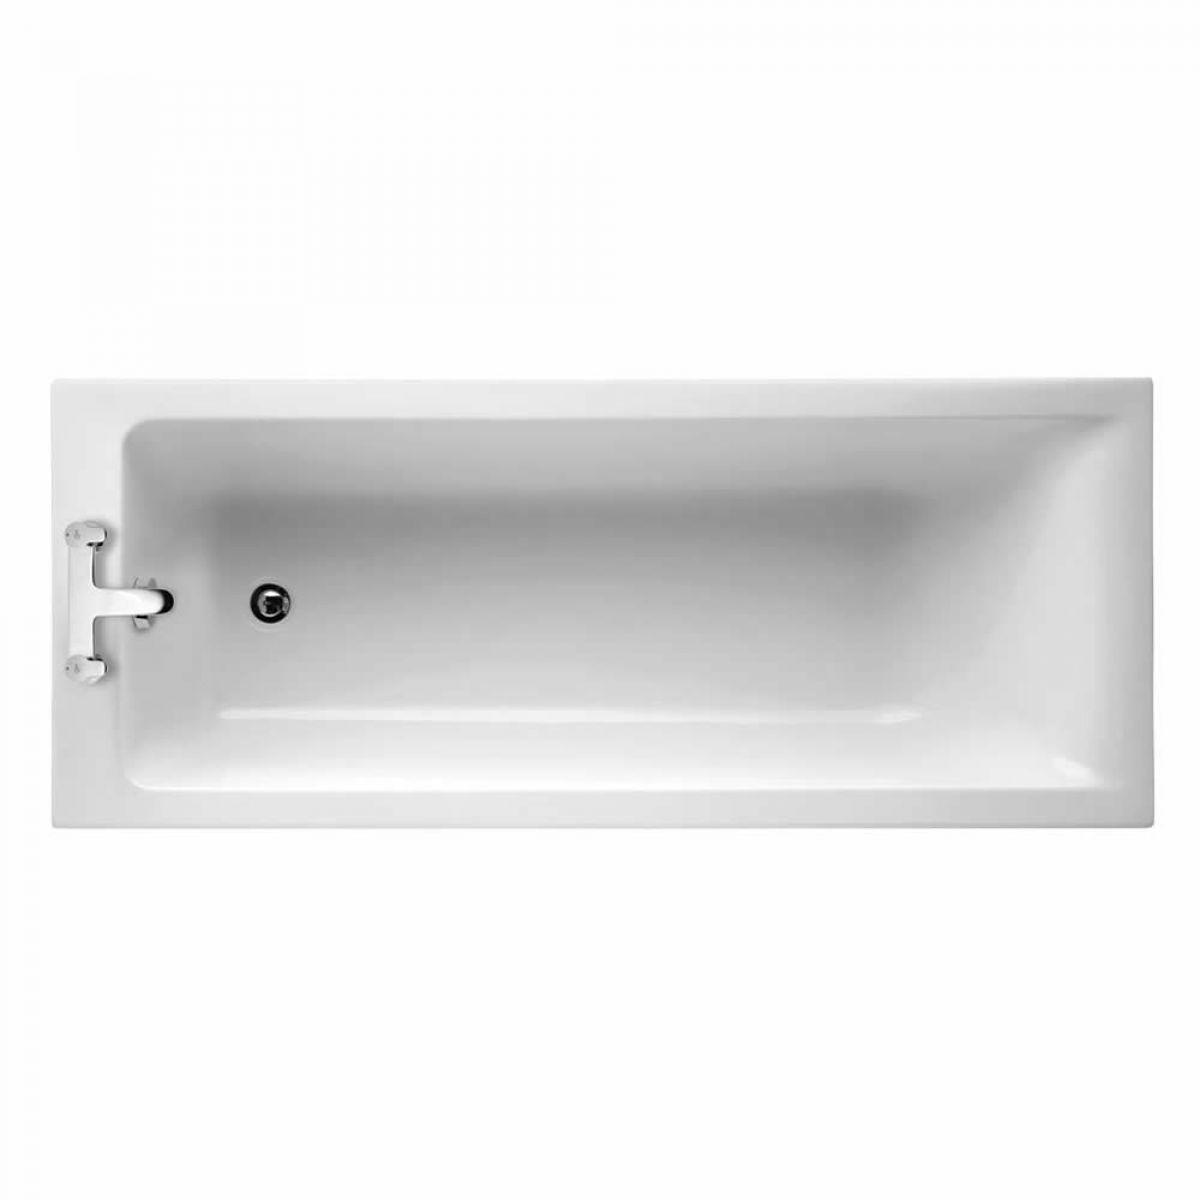 ideal standard concept idealform single ended bath uk bathrooms ideal standard concept idealform single ended bath